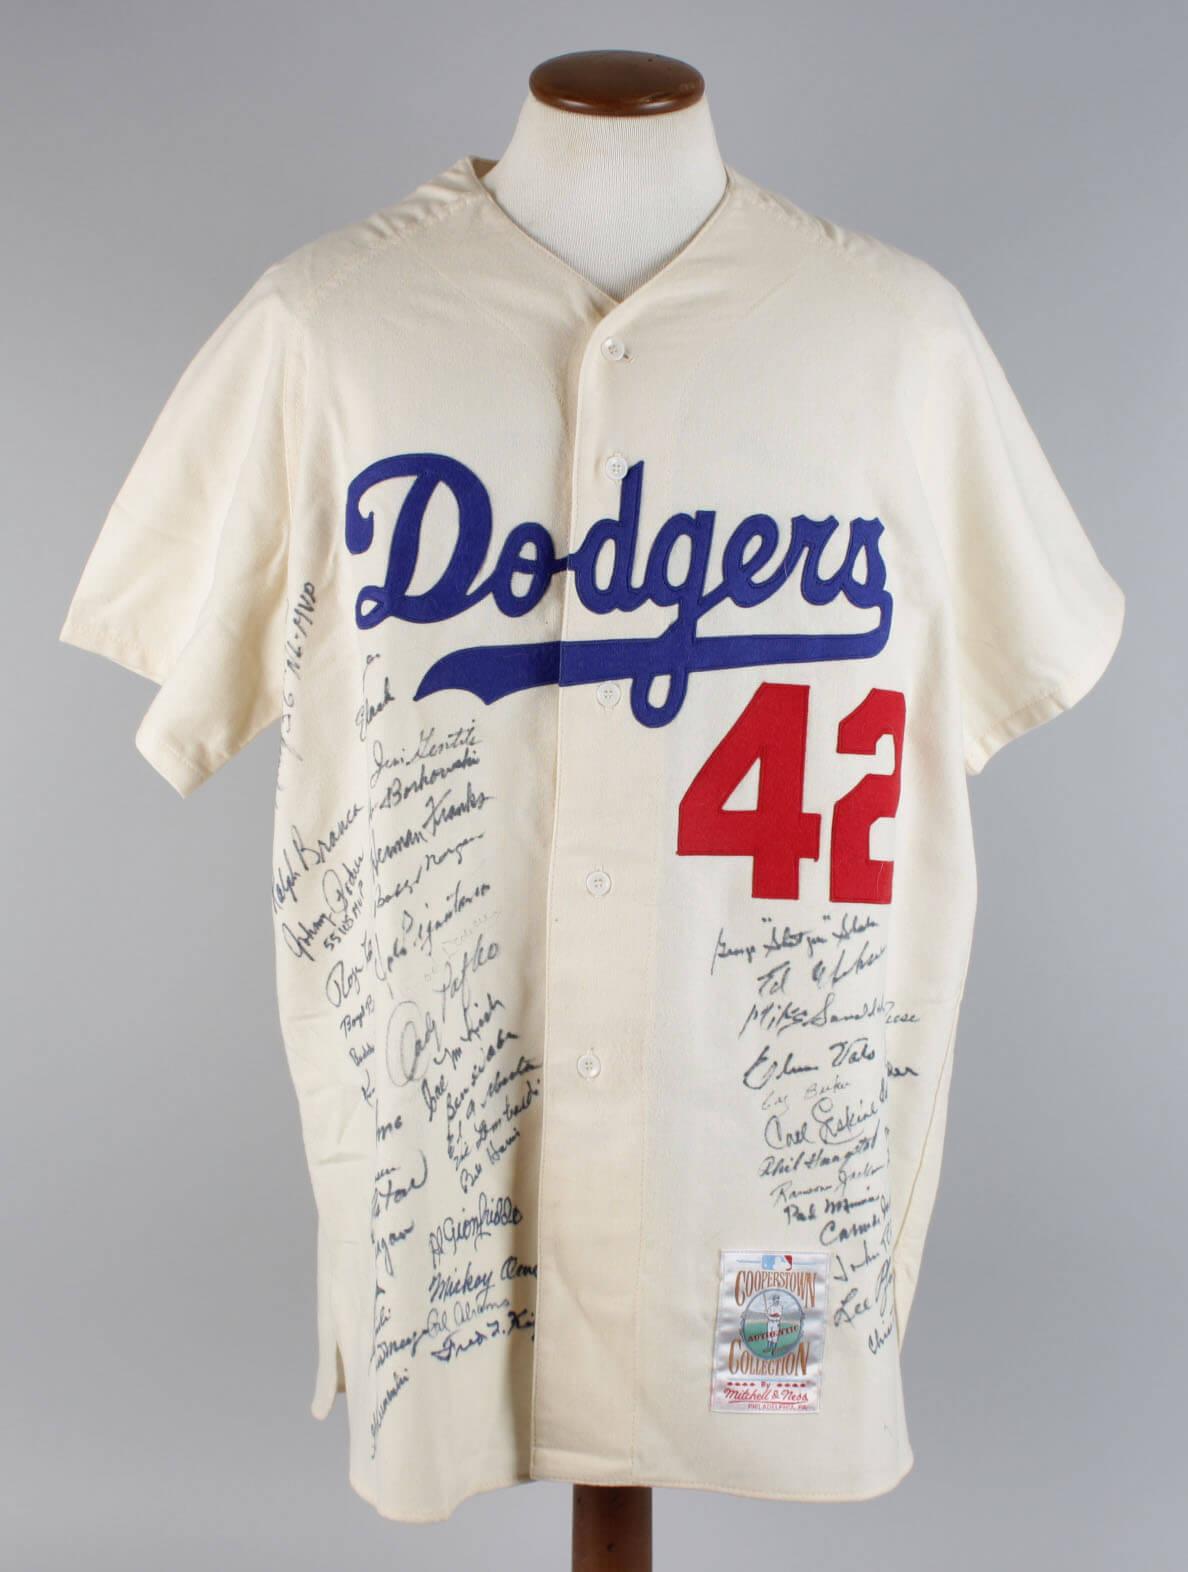 Brooklyn Dodgers Team-Signed Mitchell   Ness Jackie Robinson Jersey (51  Sigs) – JSA c06489693f1